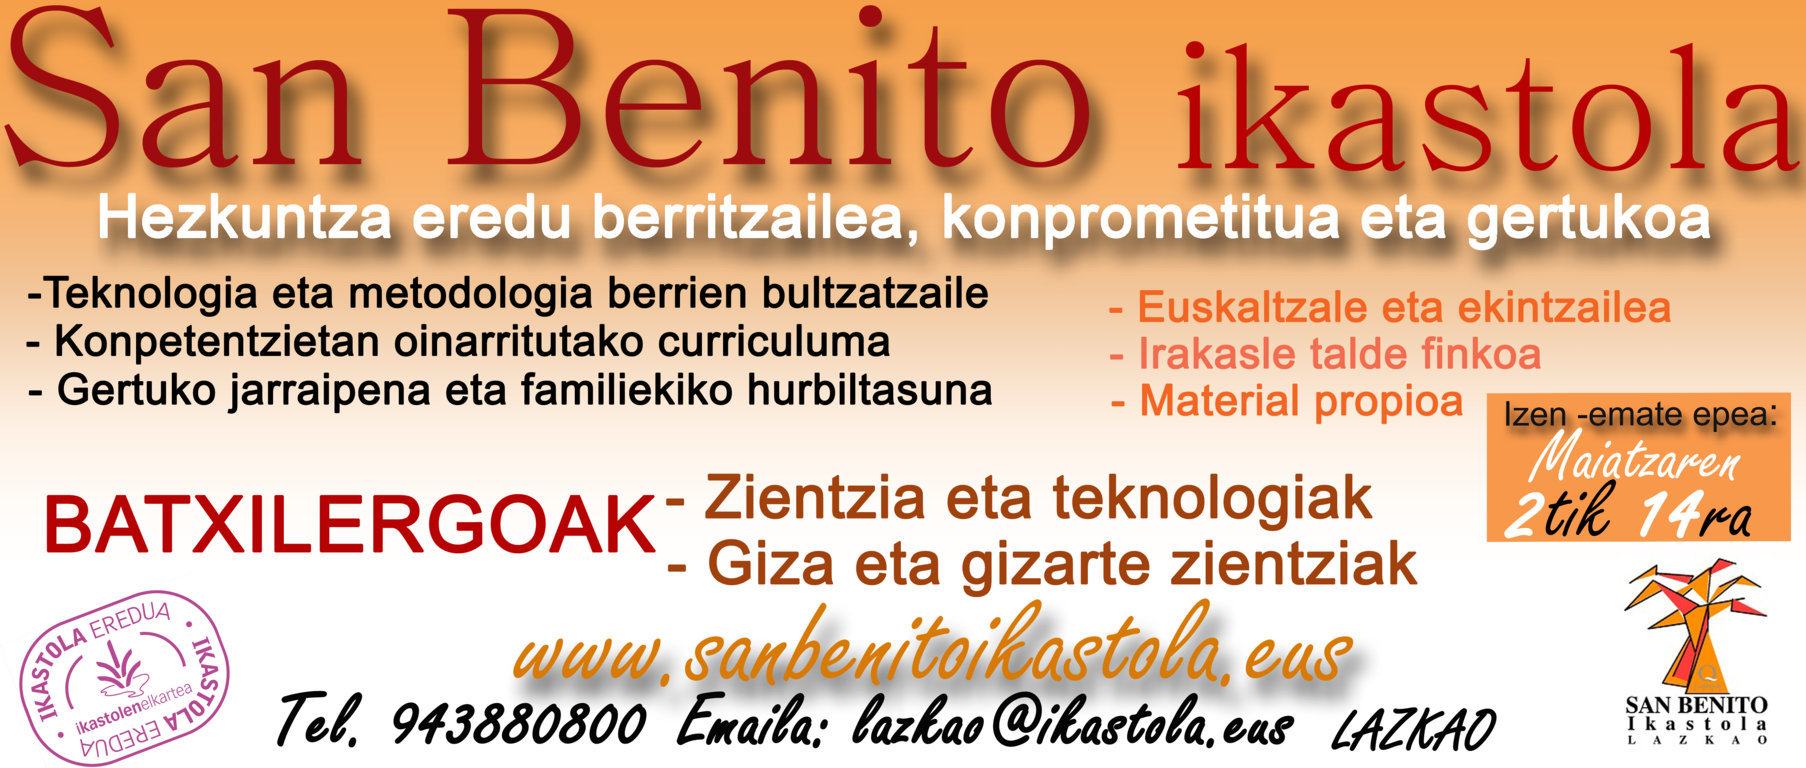 hitza_m31atrikulazio3x2-2018_batxi_fileminimizer.jpg